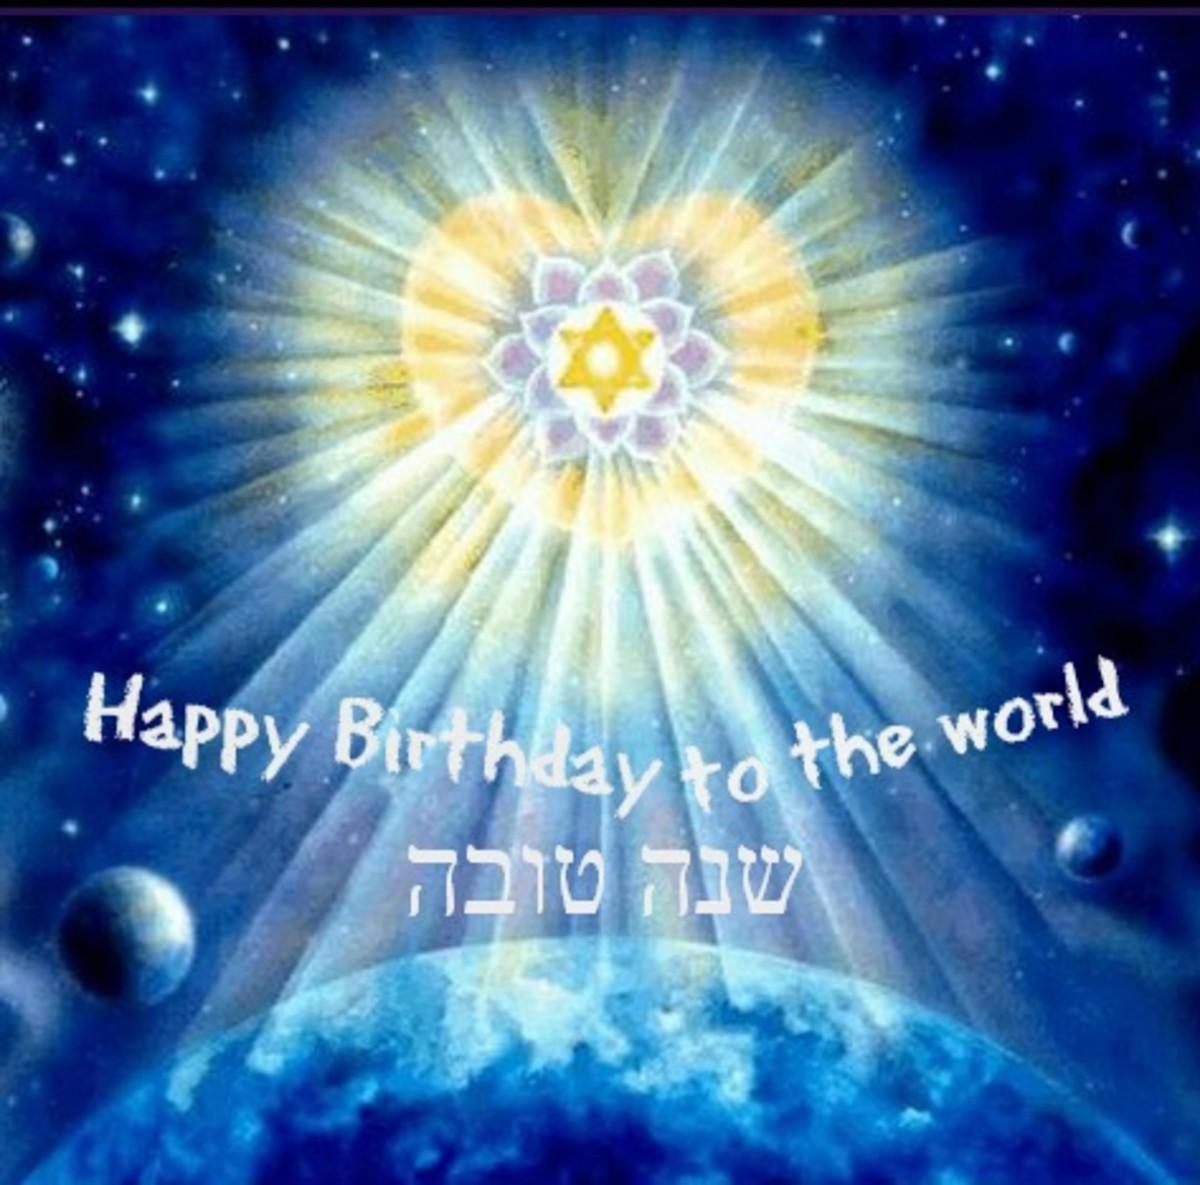 Happy Birthday to the World - Happy New Year